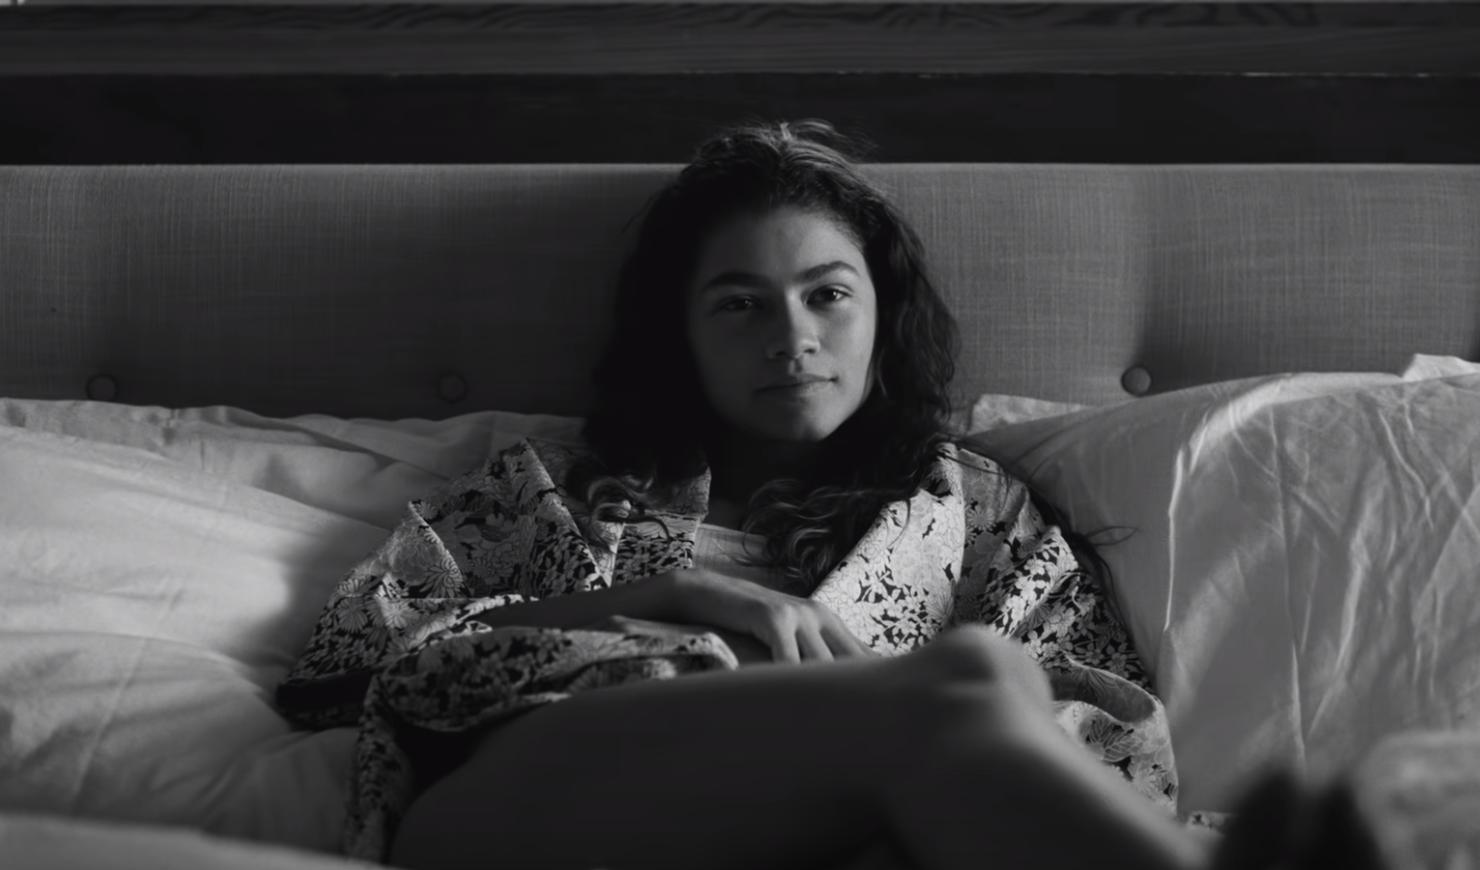 Zendaya laying in bed in Malcom & Marie